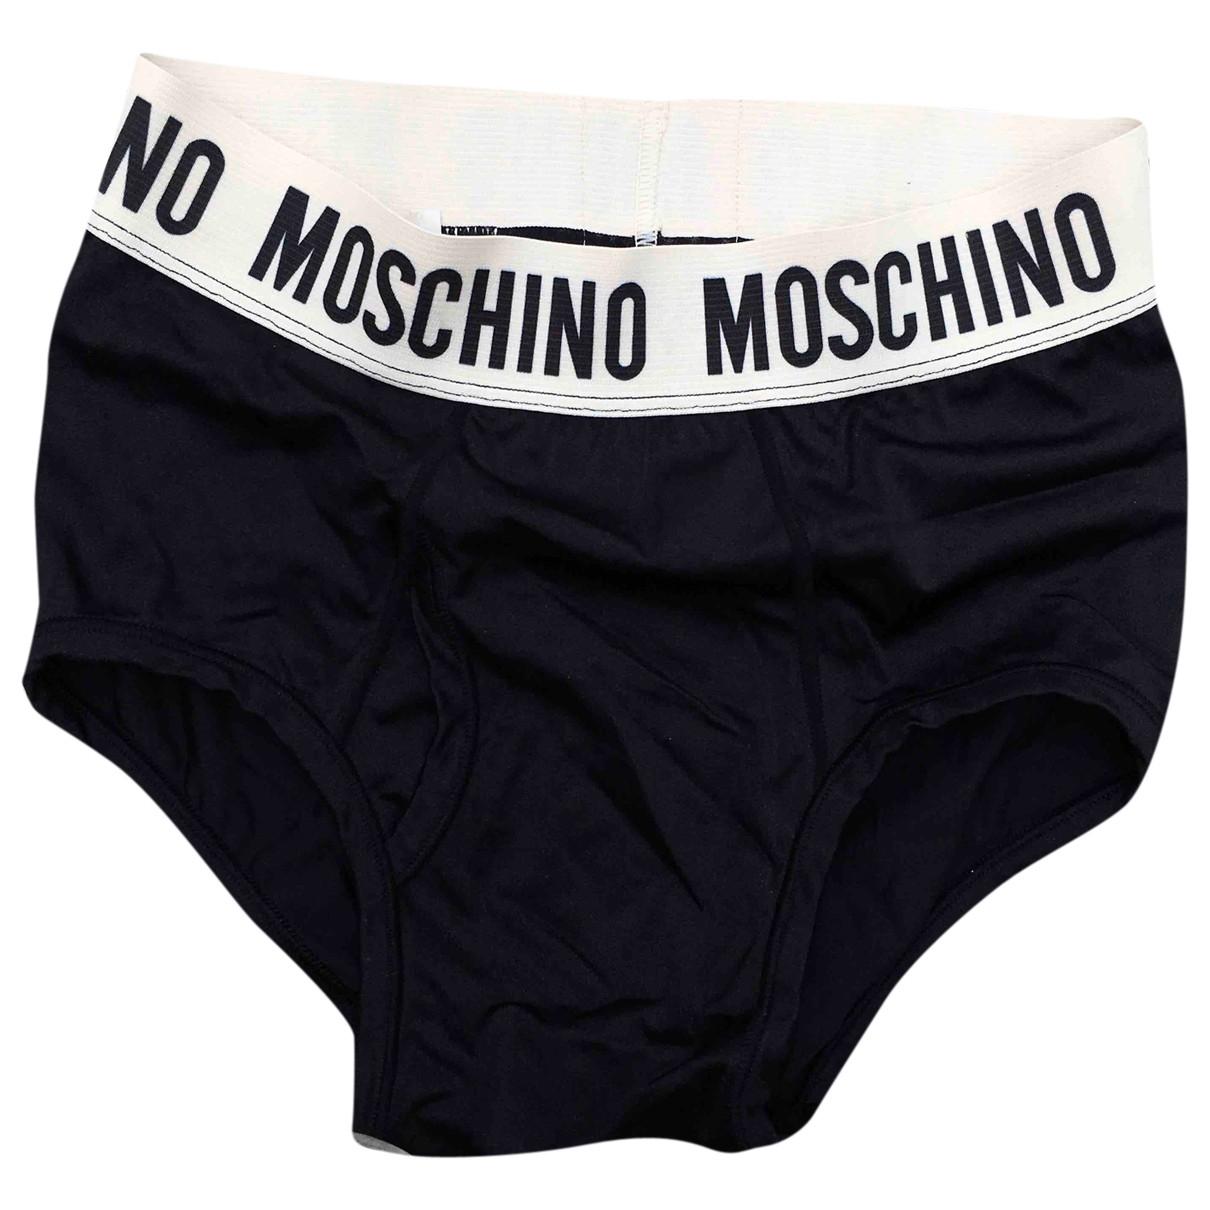 Traje de baño Moschino Cheap And Chic